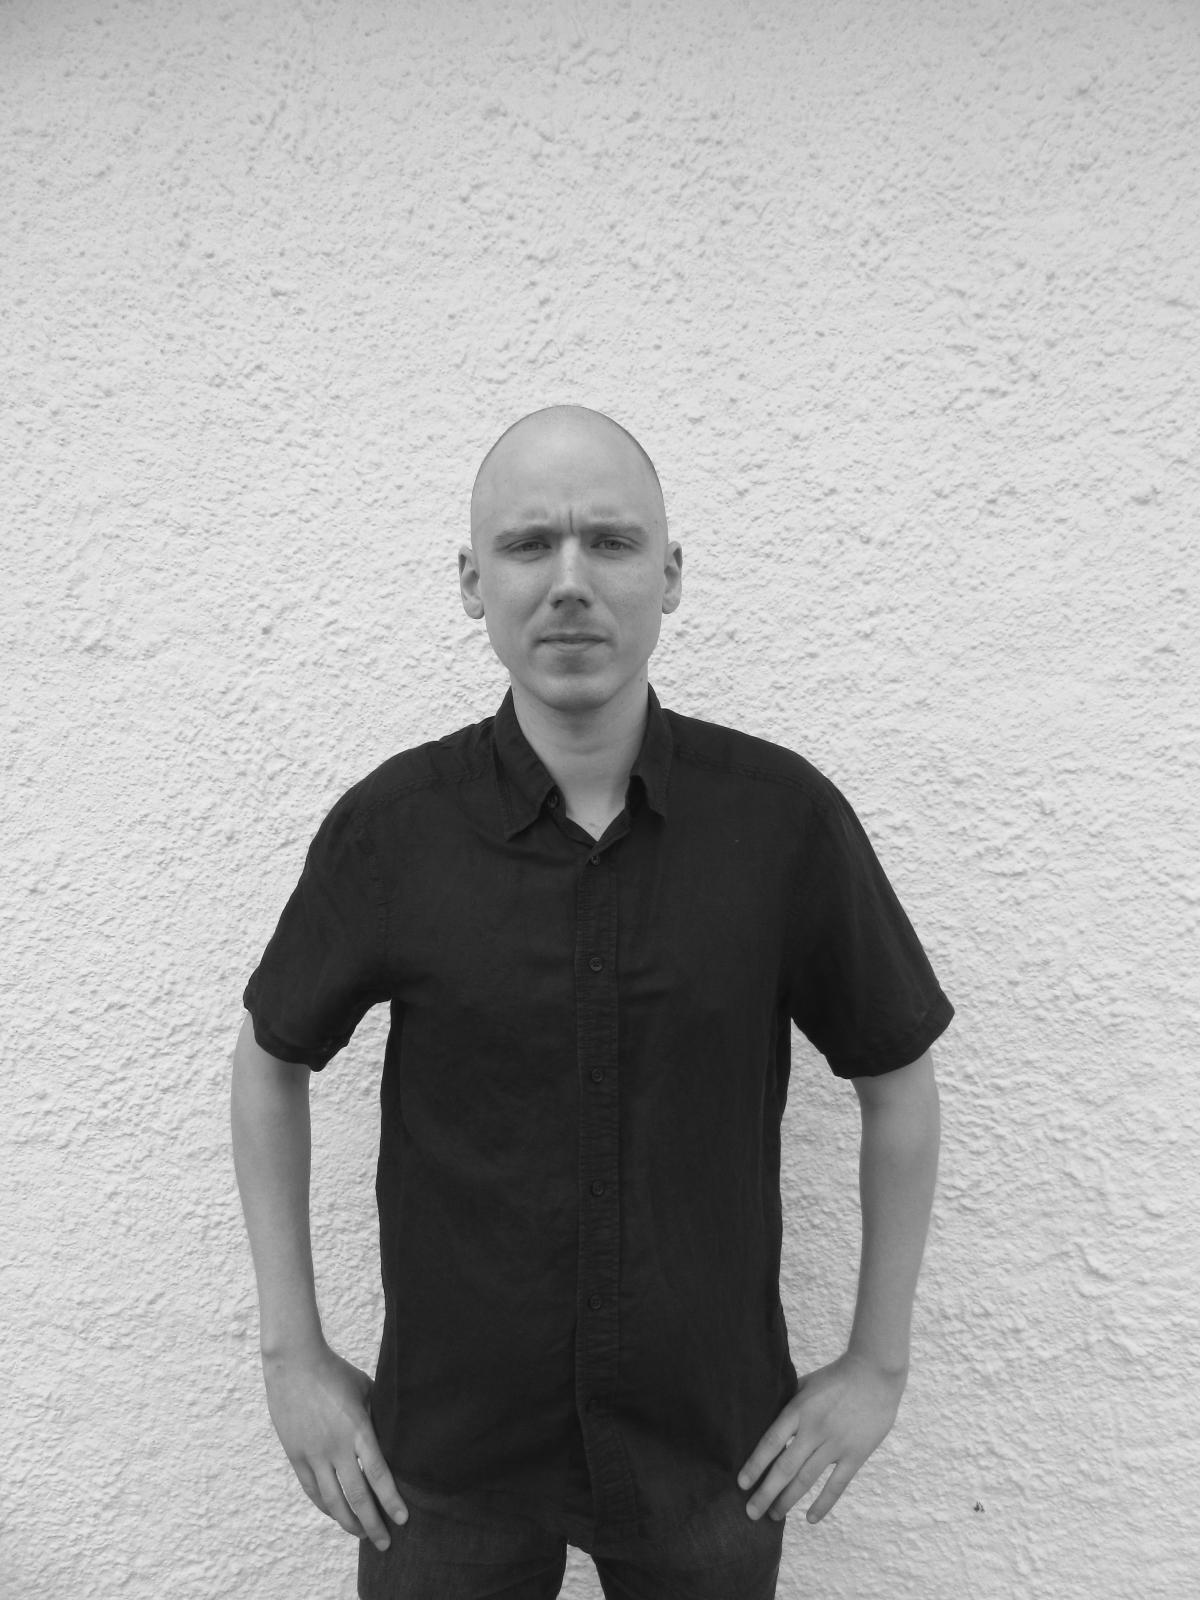 Kristoffer Lerche-Thomsen